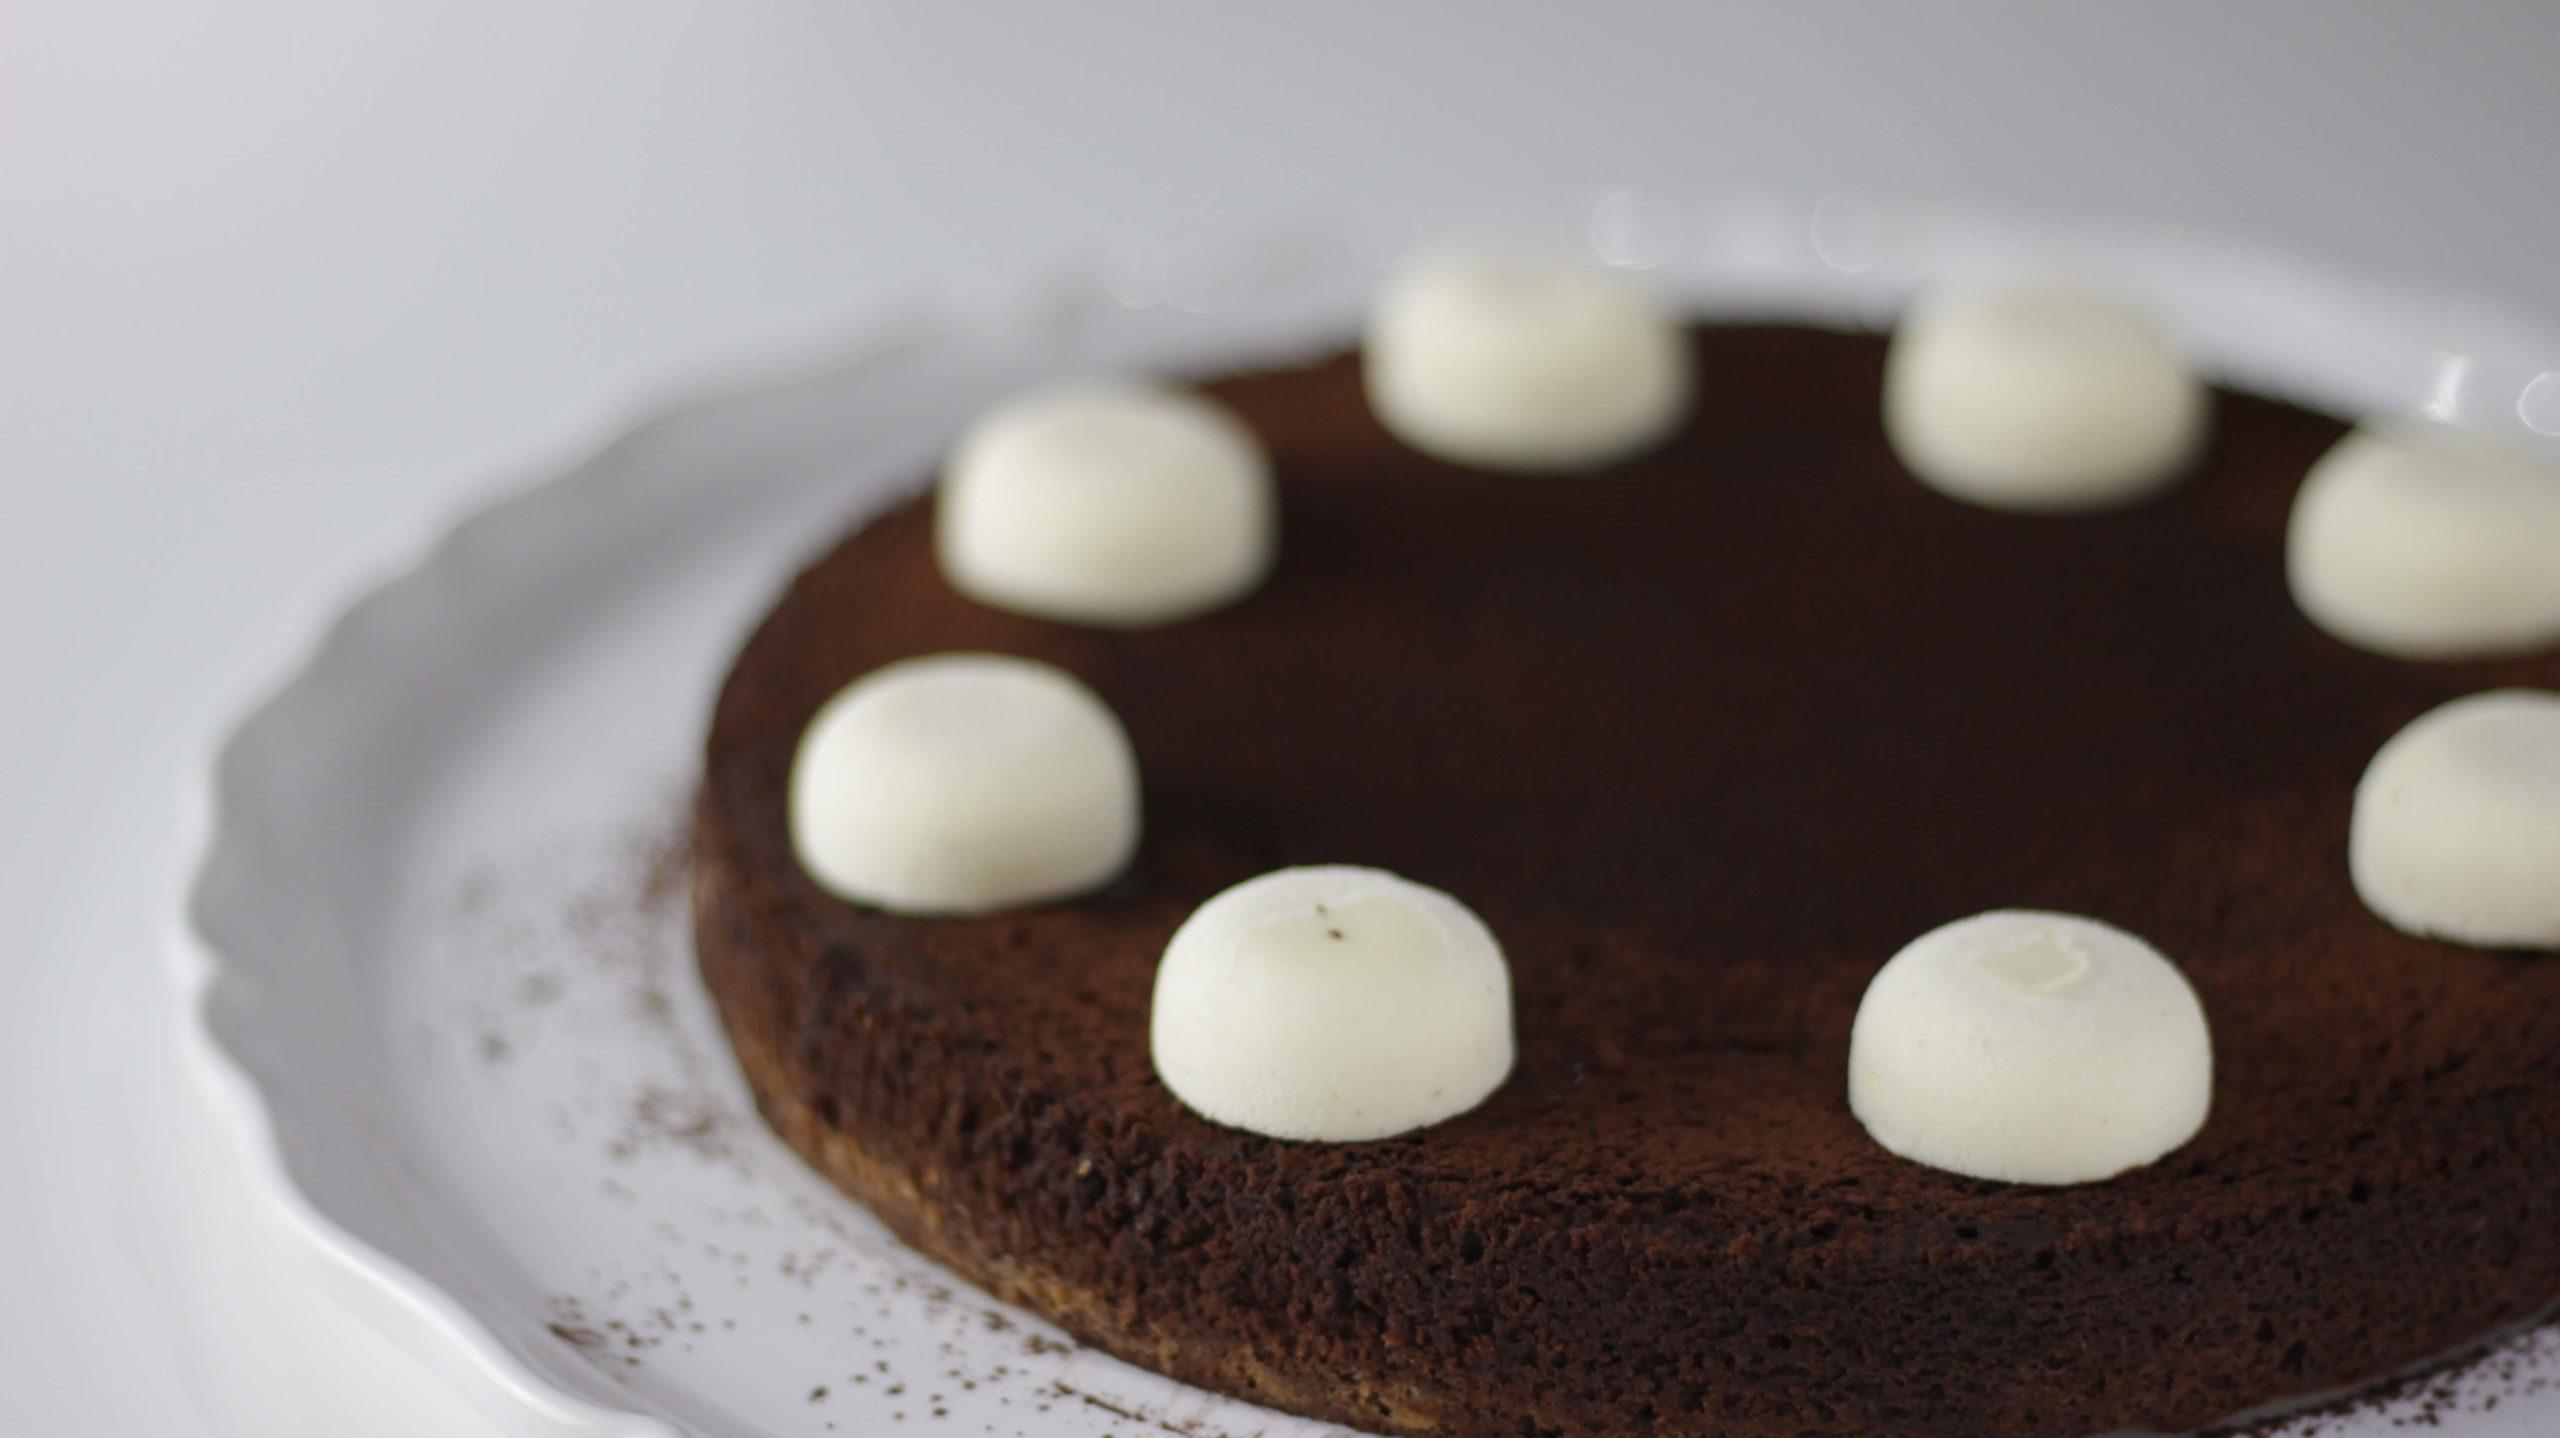 Tarta de chocolate con biscuit glacé de vainilla